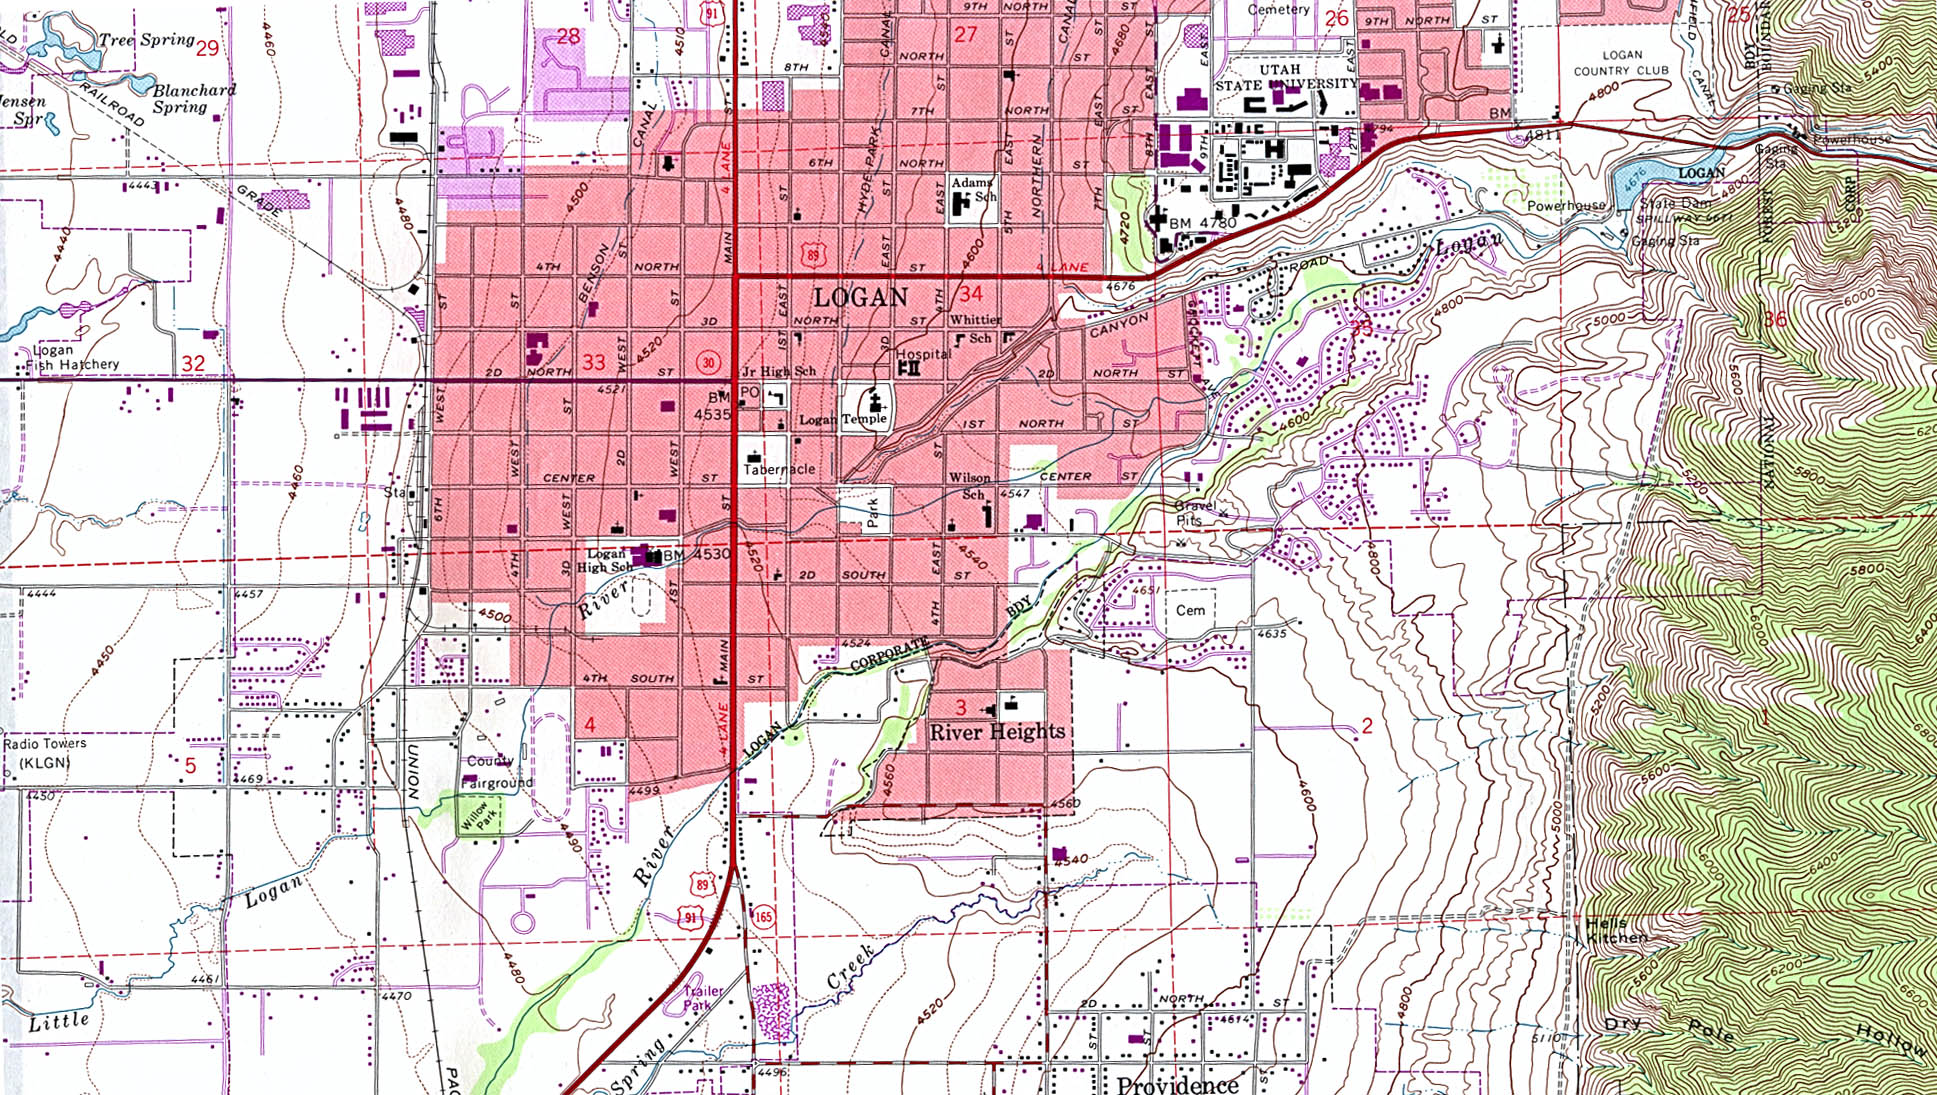 Logan Topographic City Map, Utah, United States